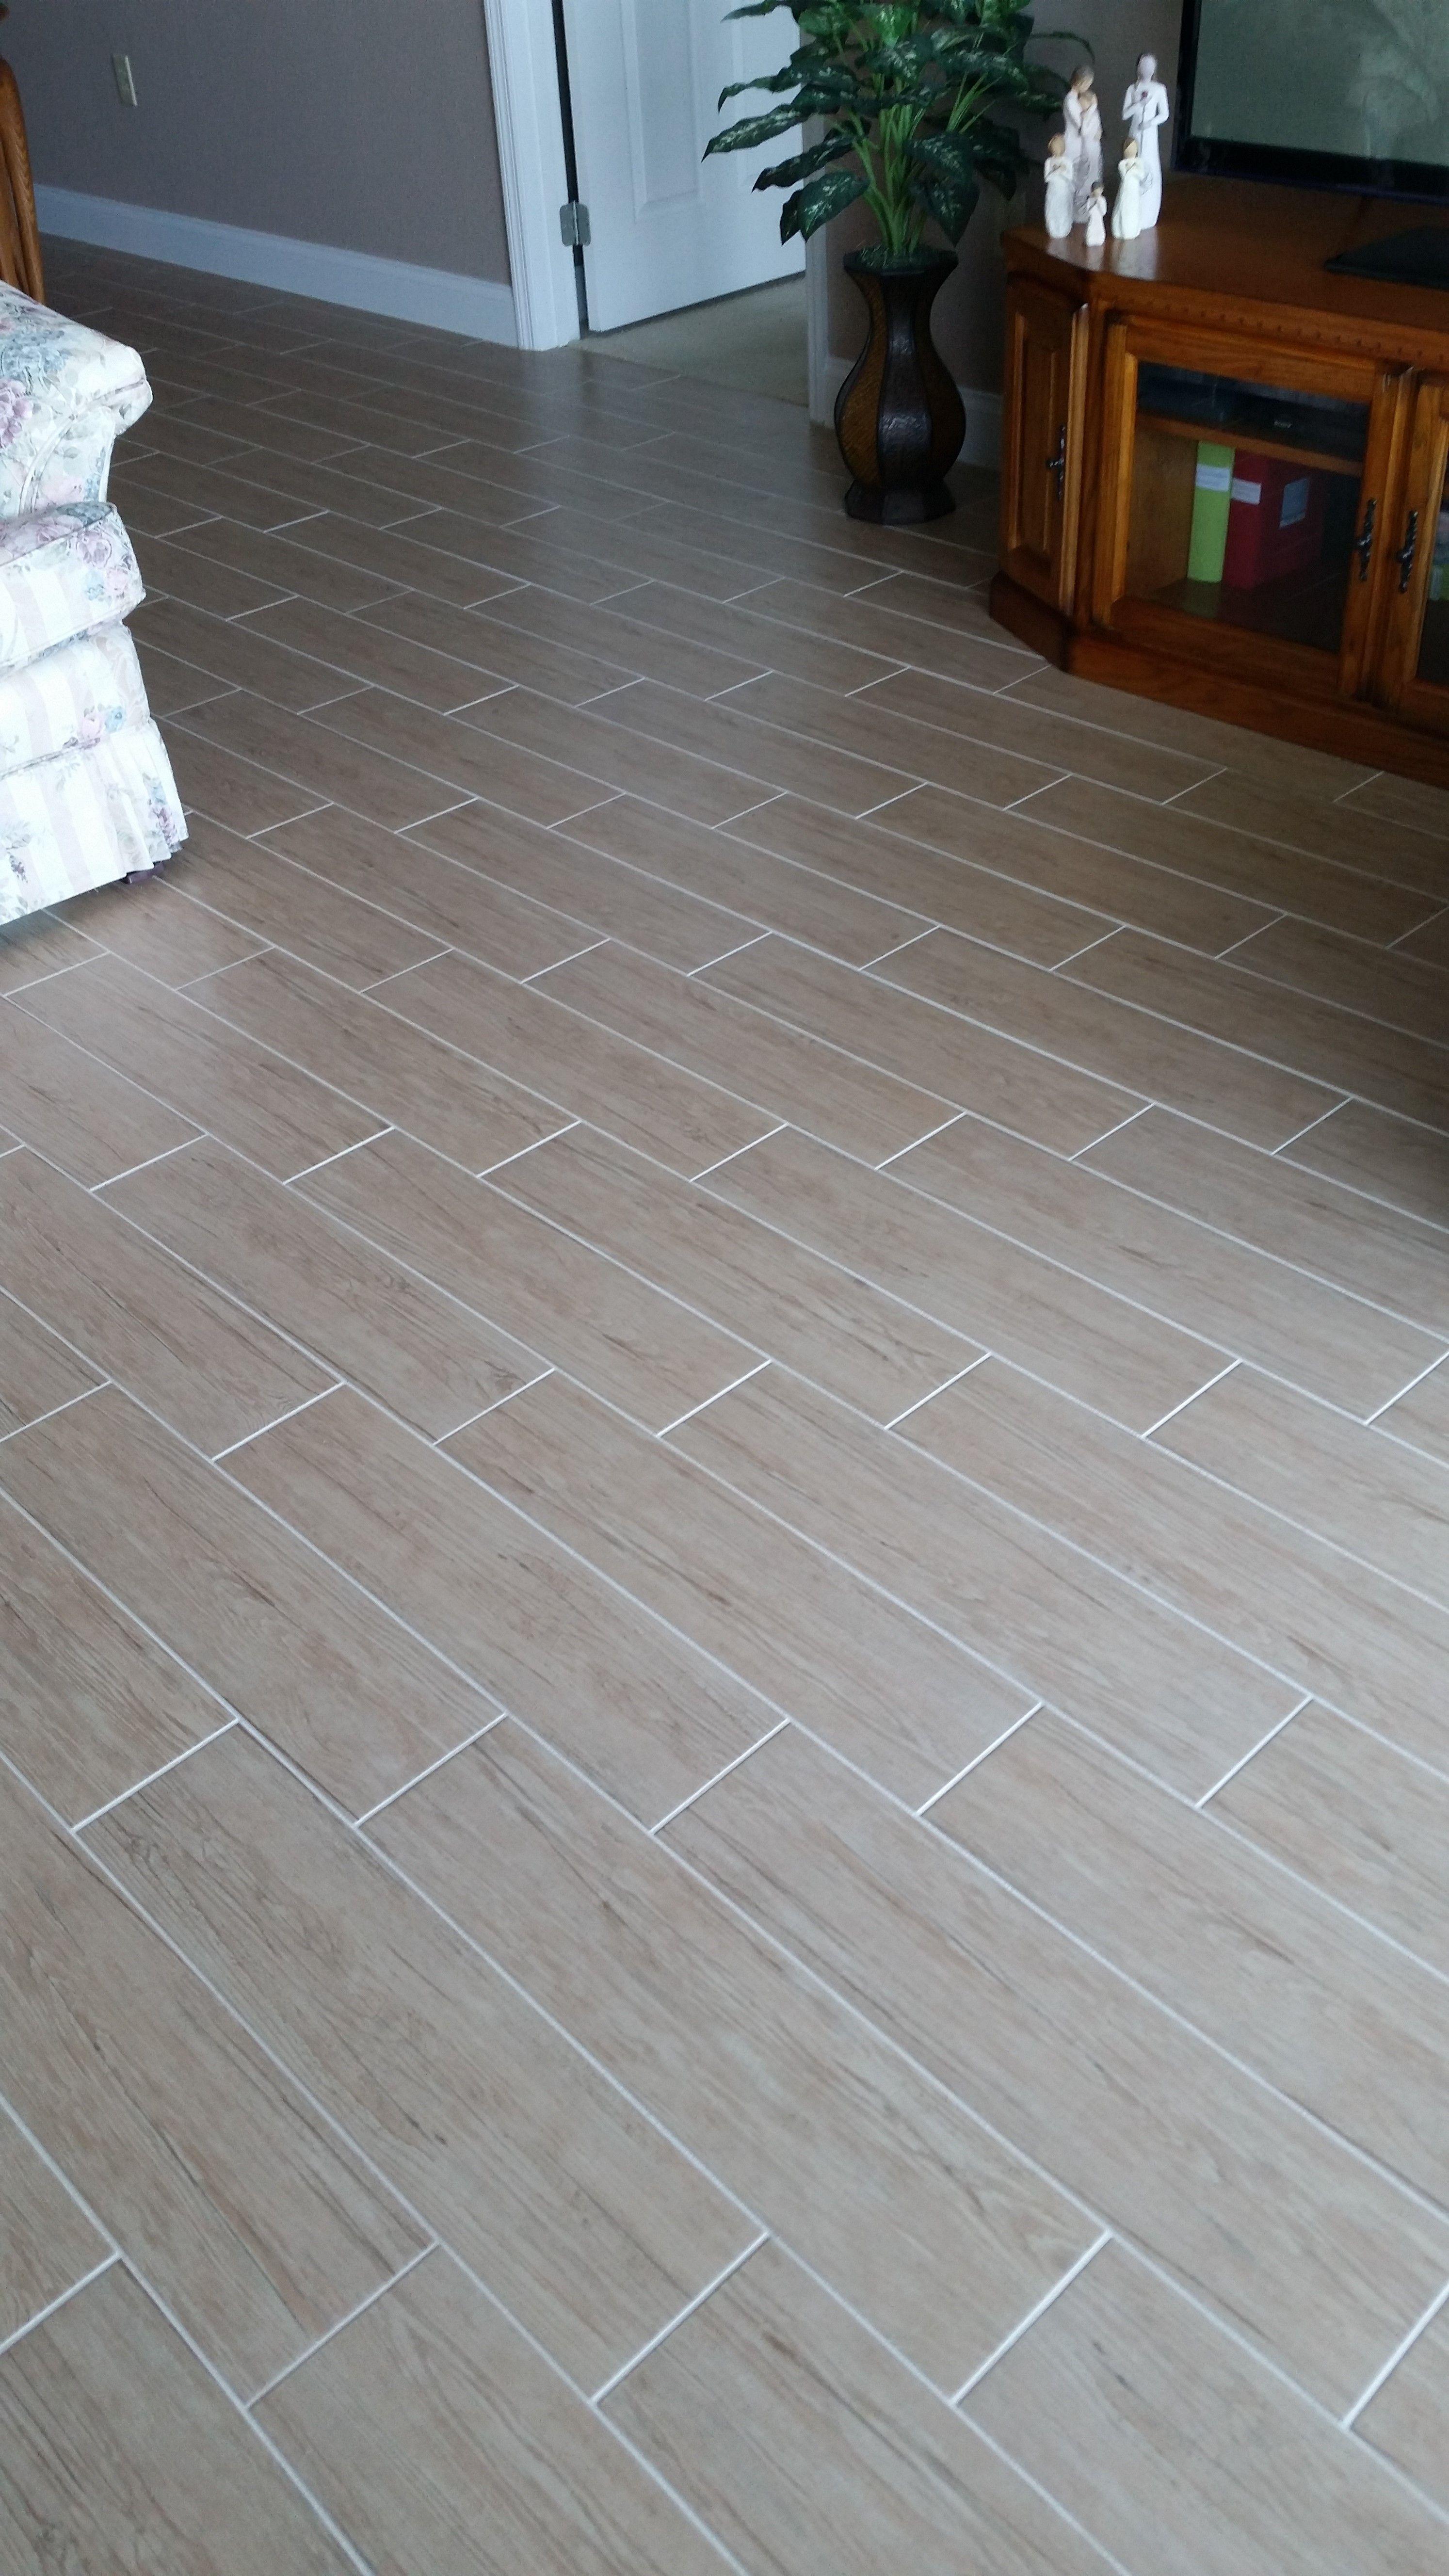 Aloha Carpet Floor Covering Vinyl Wood Flooring Tiles Wood Vinyl